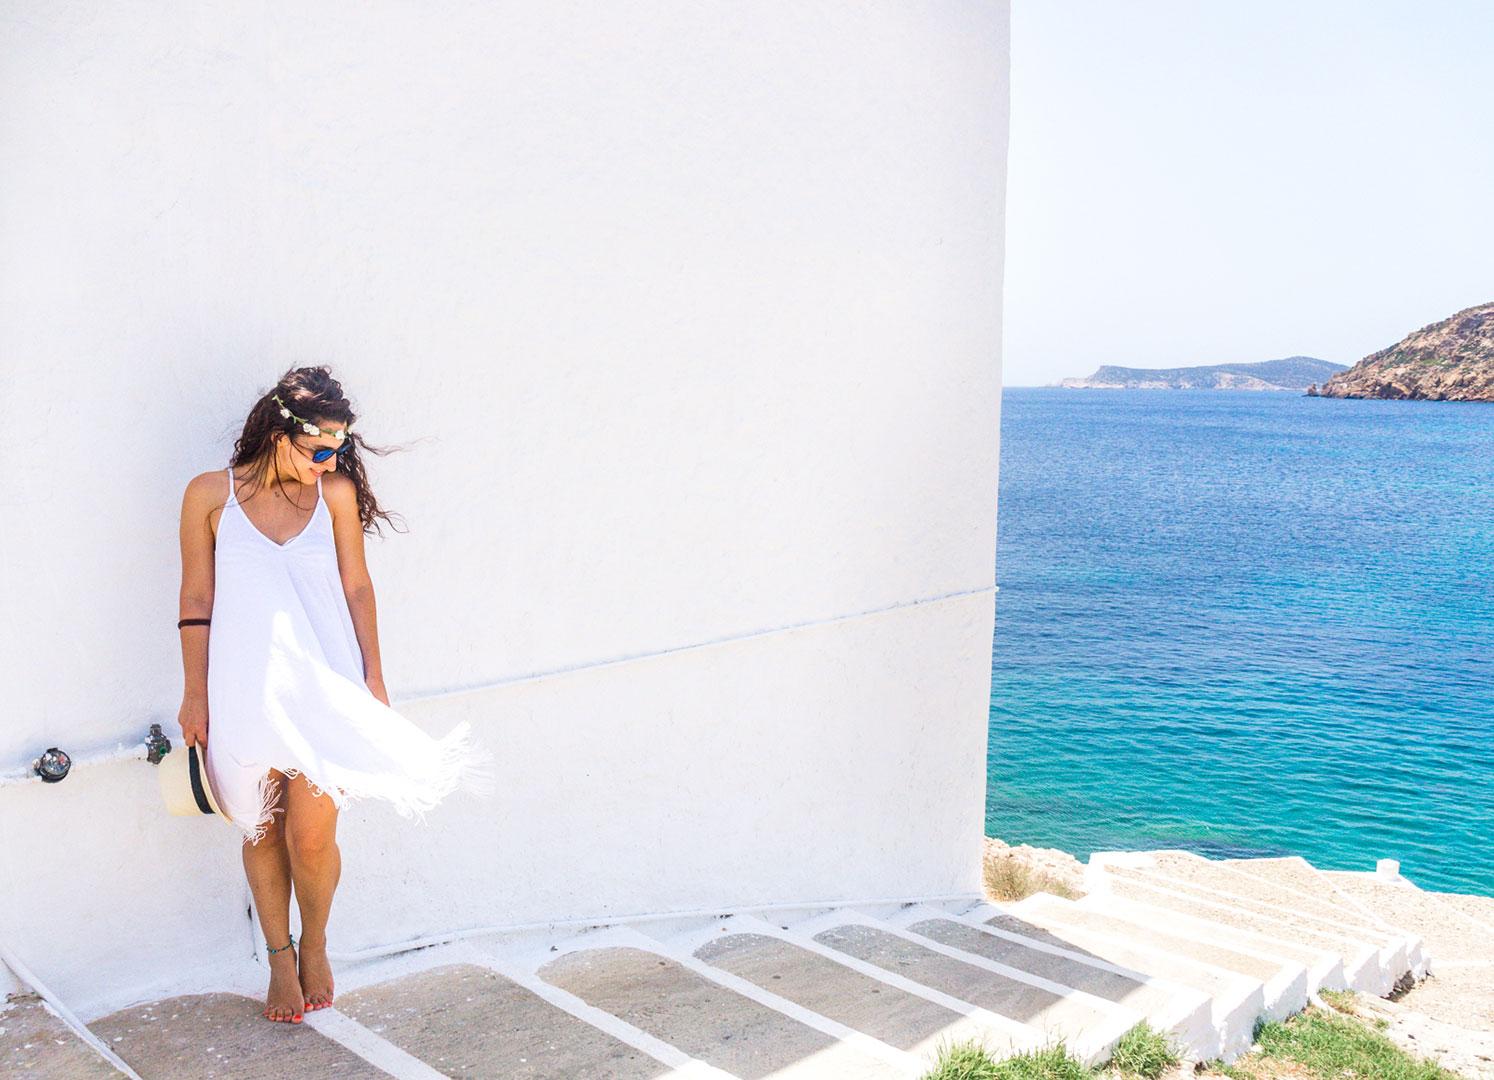 sifnos-greece-la-vie-en-blog-all-rights-reserved-24